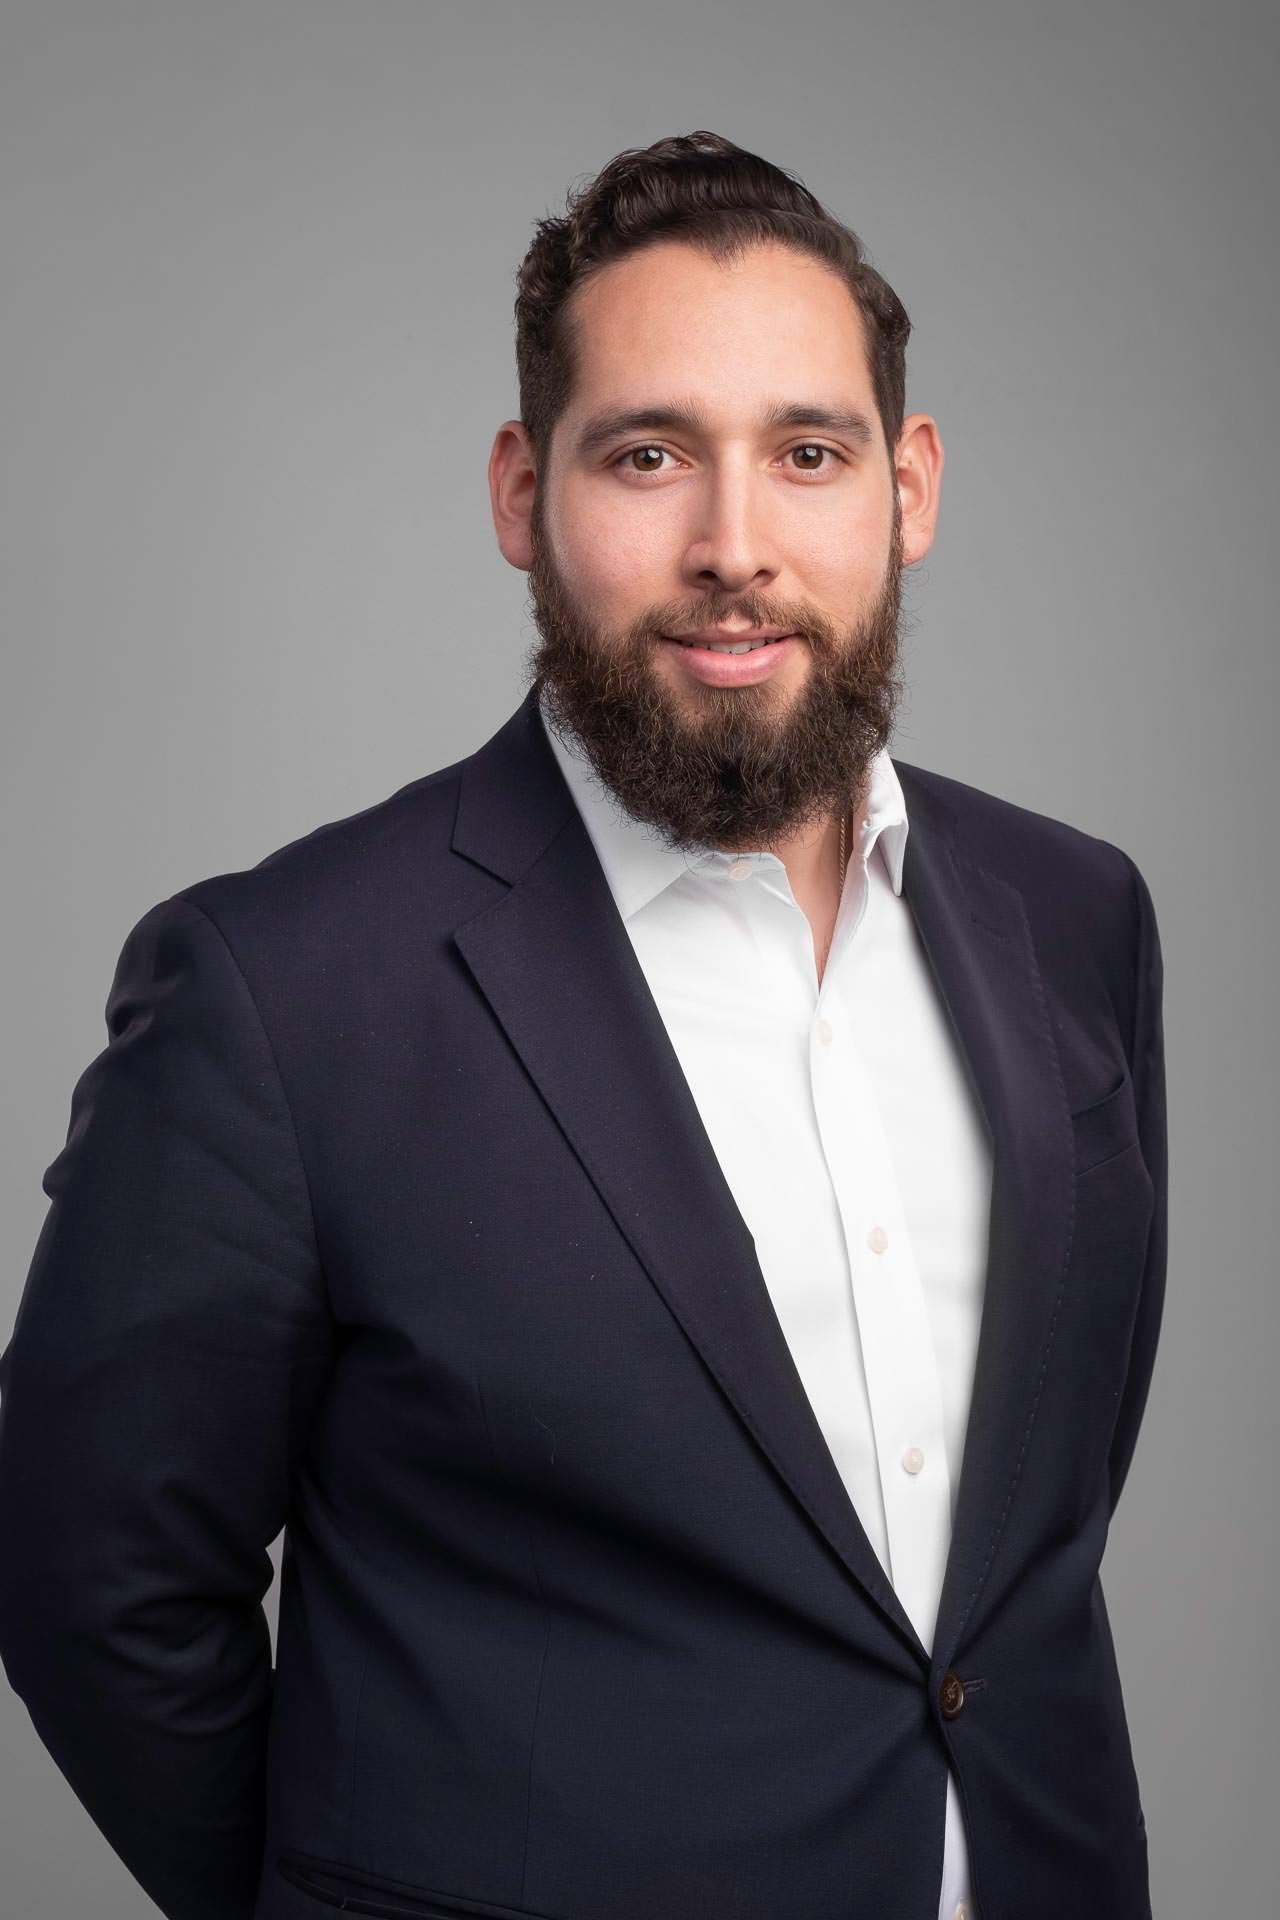 Mike Sevilla